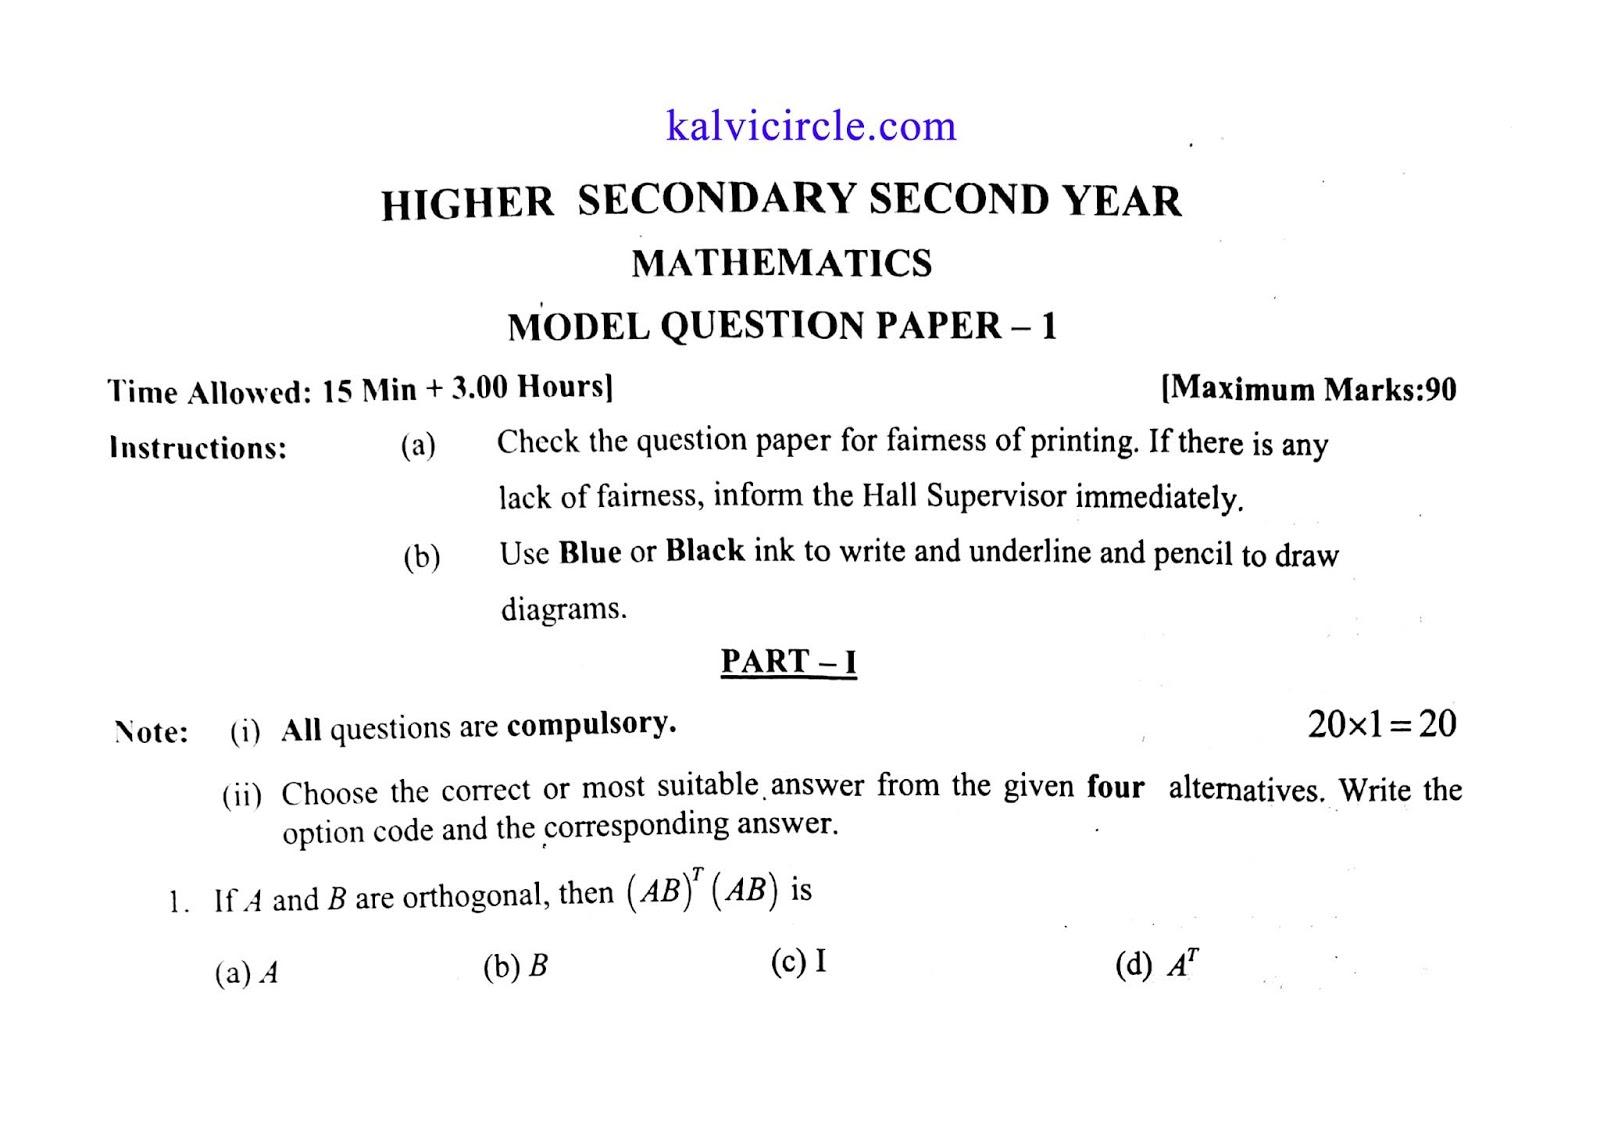 12th Std Mathematics PTA book Model Question and Answer Key(1,2,3,4,5,6) (English Medium) - 2020 ...